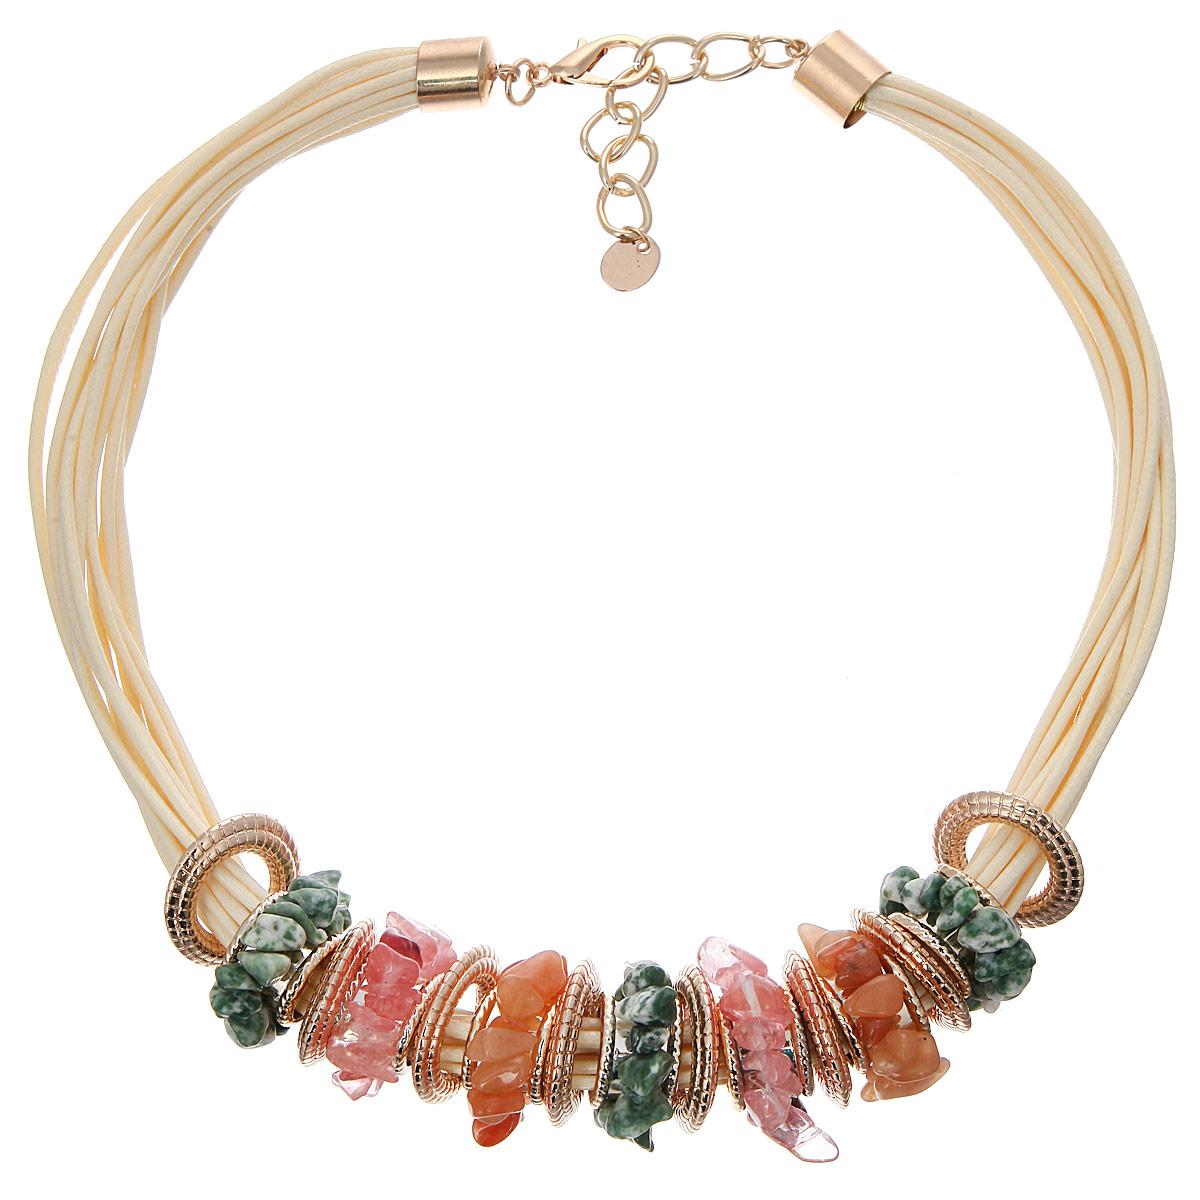 Колье/ожерелье бижутерное Taya